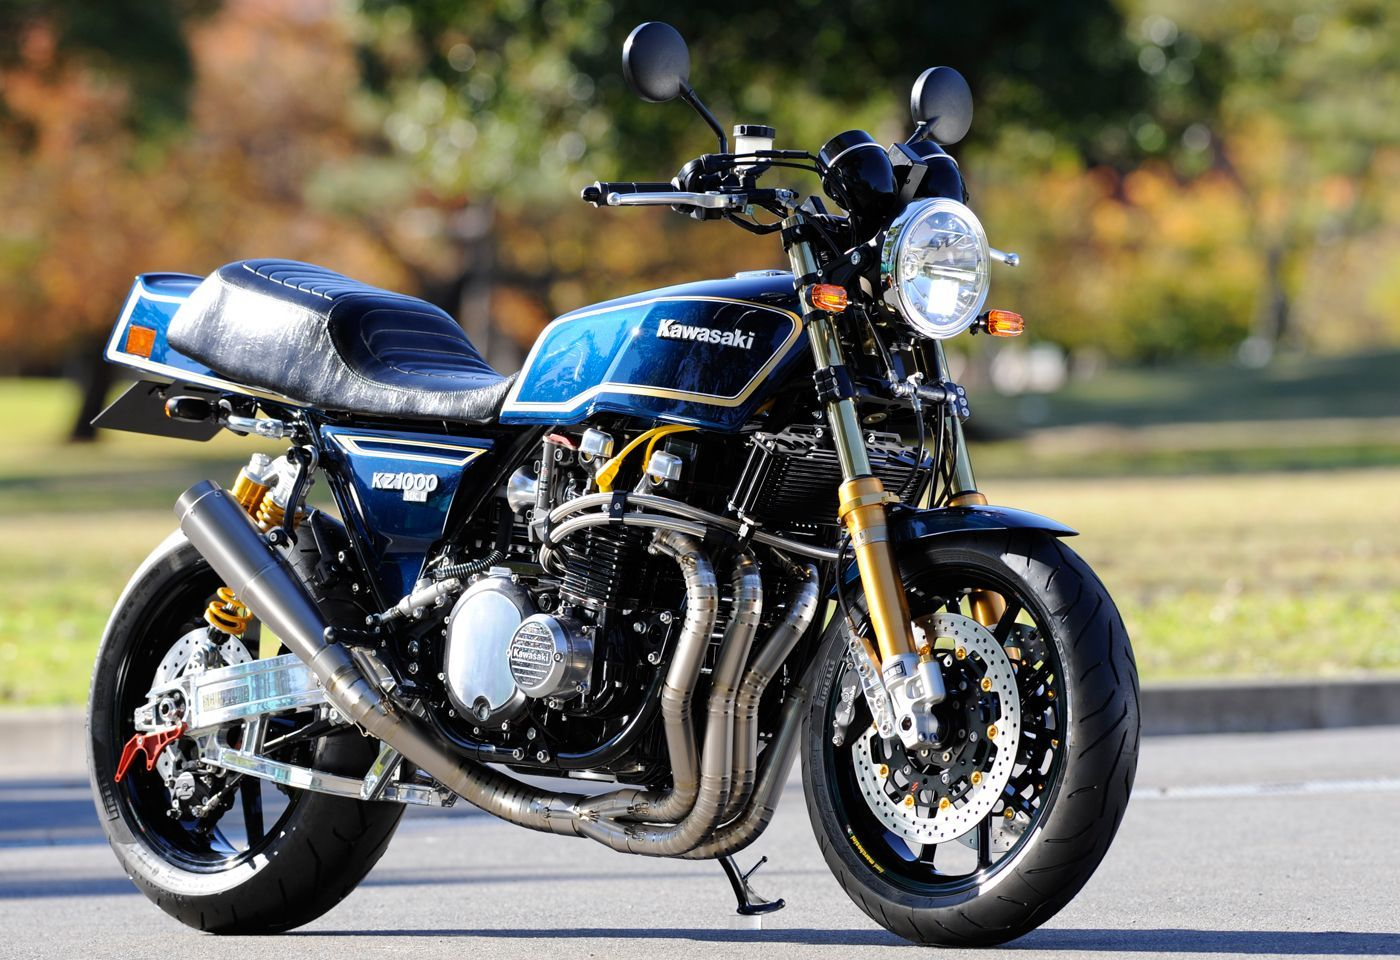 Kz1000mk2カスタム Kz1000 Kawasaki Motorcycles Old Bikes Motorcycle Baby